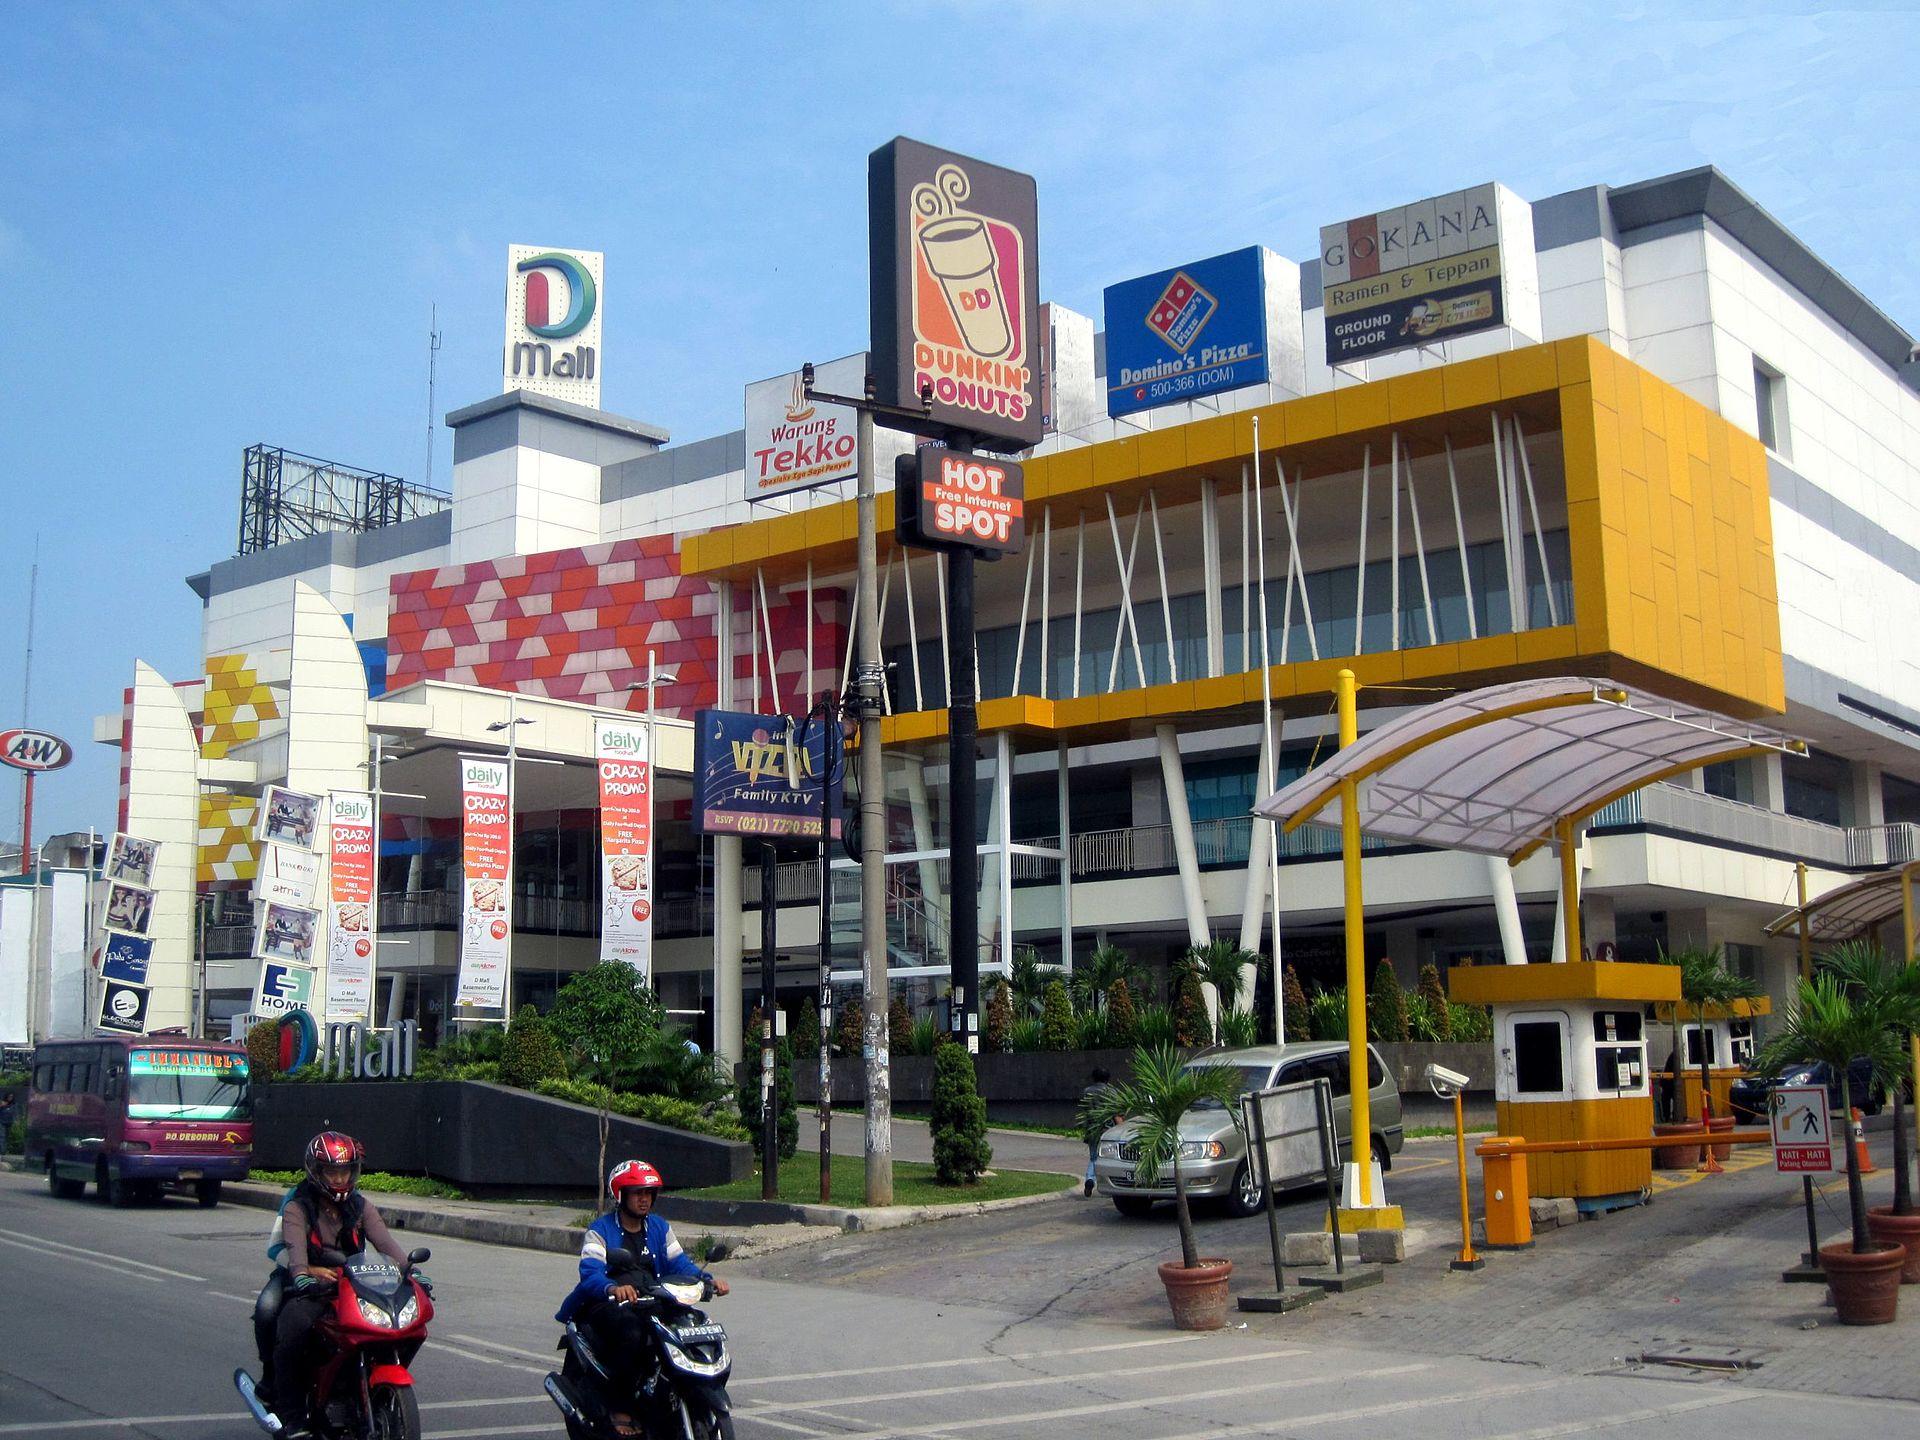 Dmall Depok - Wikipedia bahasa Indonesia, ensiklopedia bebas